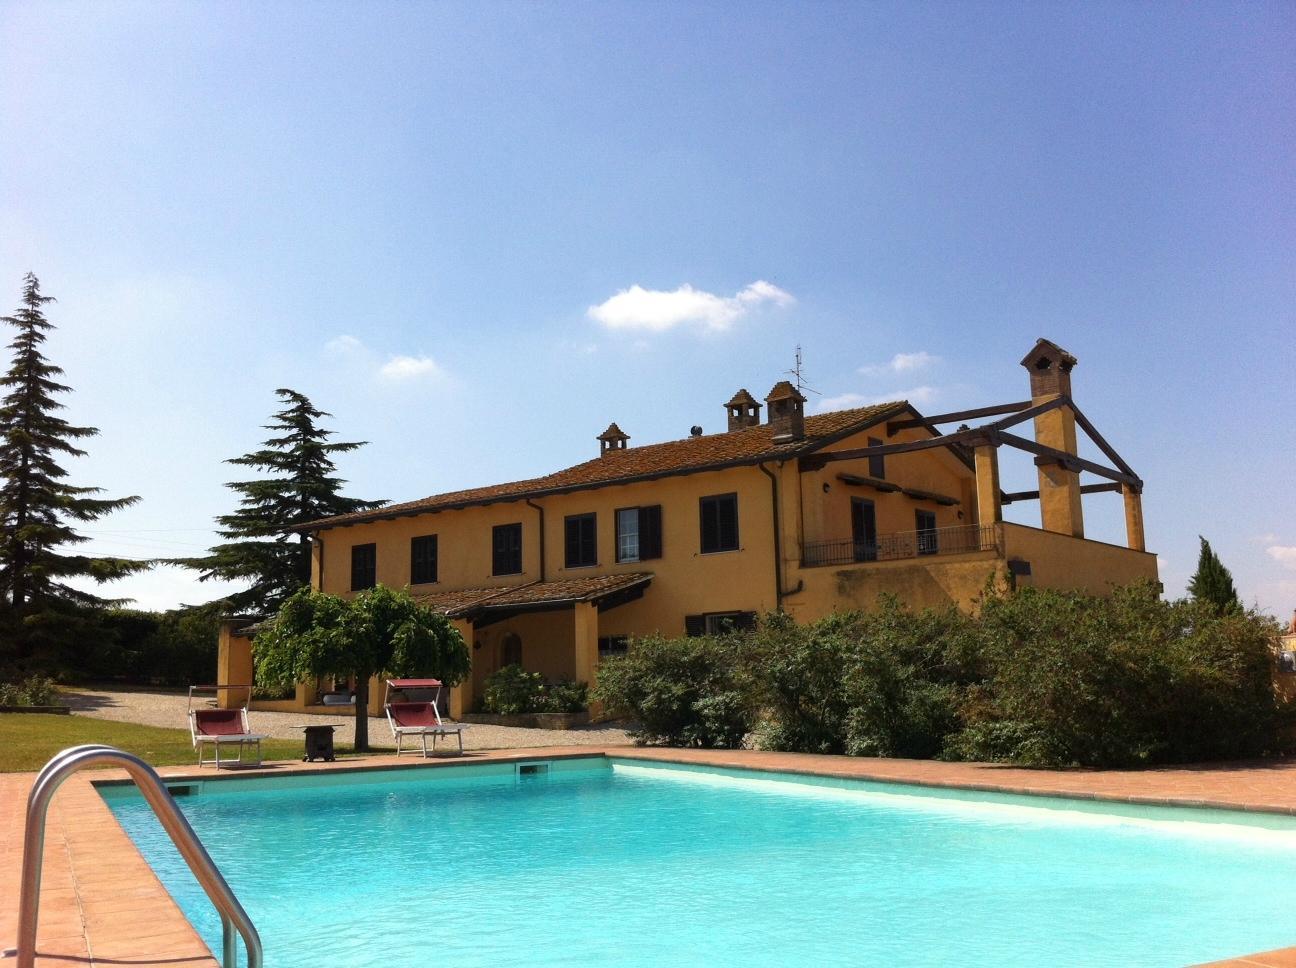 B&B San Martino Luxury Home